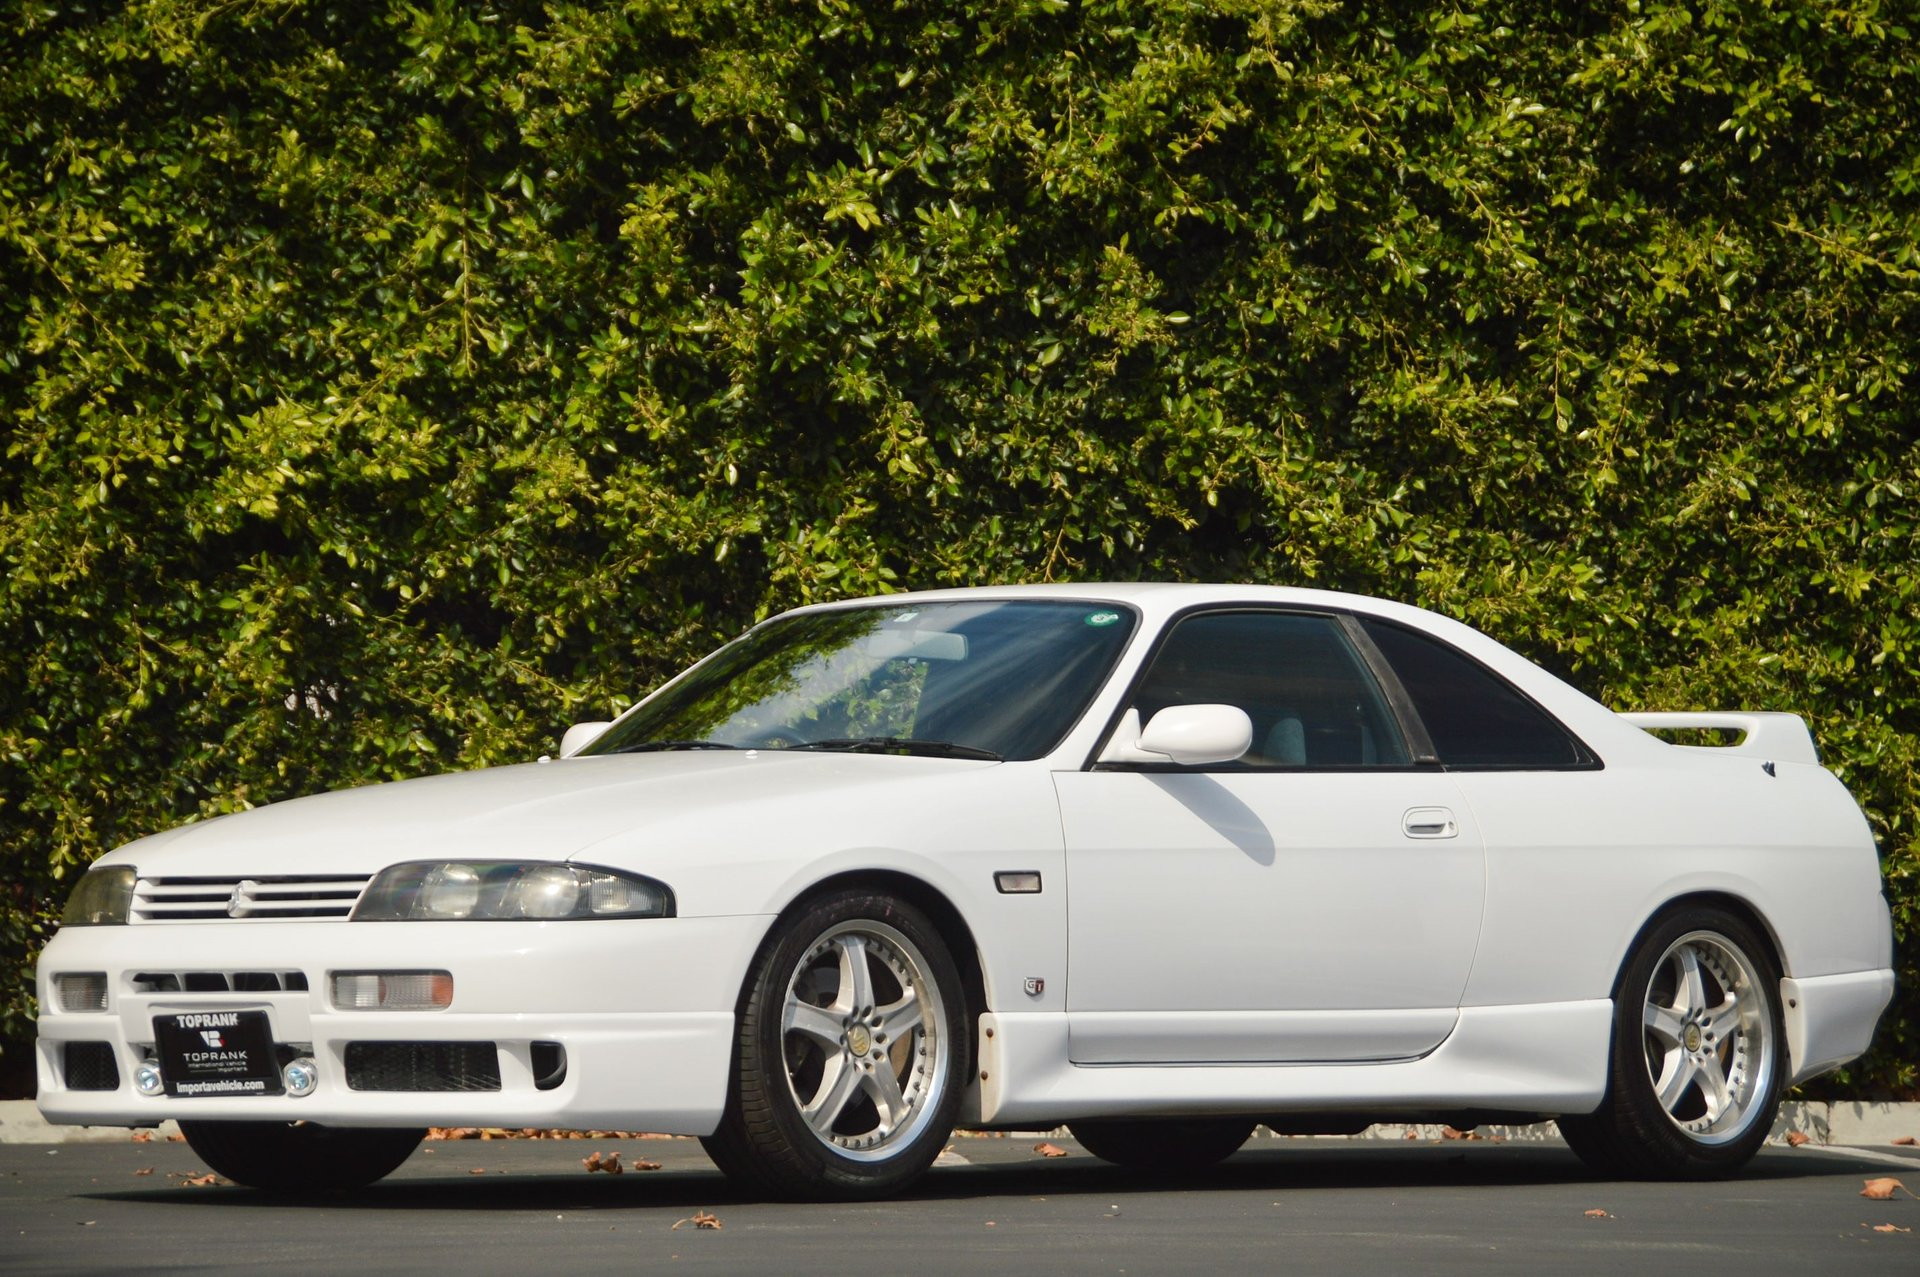 1995 Nissan Skyline R33 GTS25T